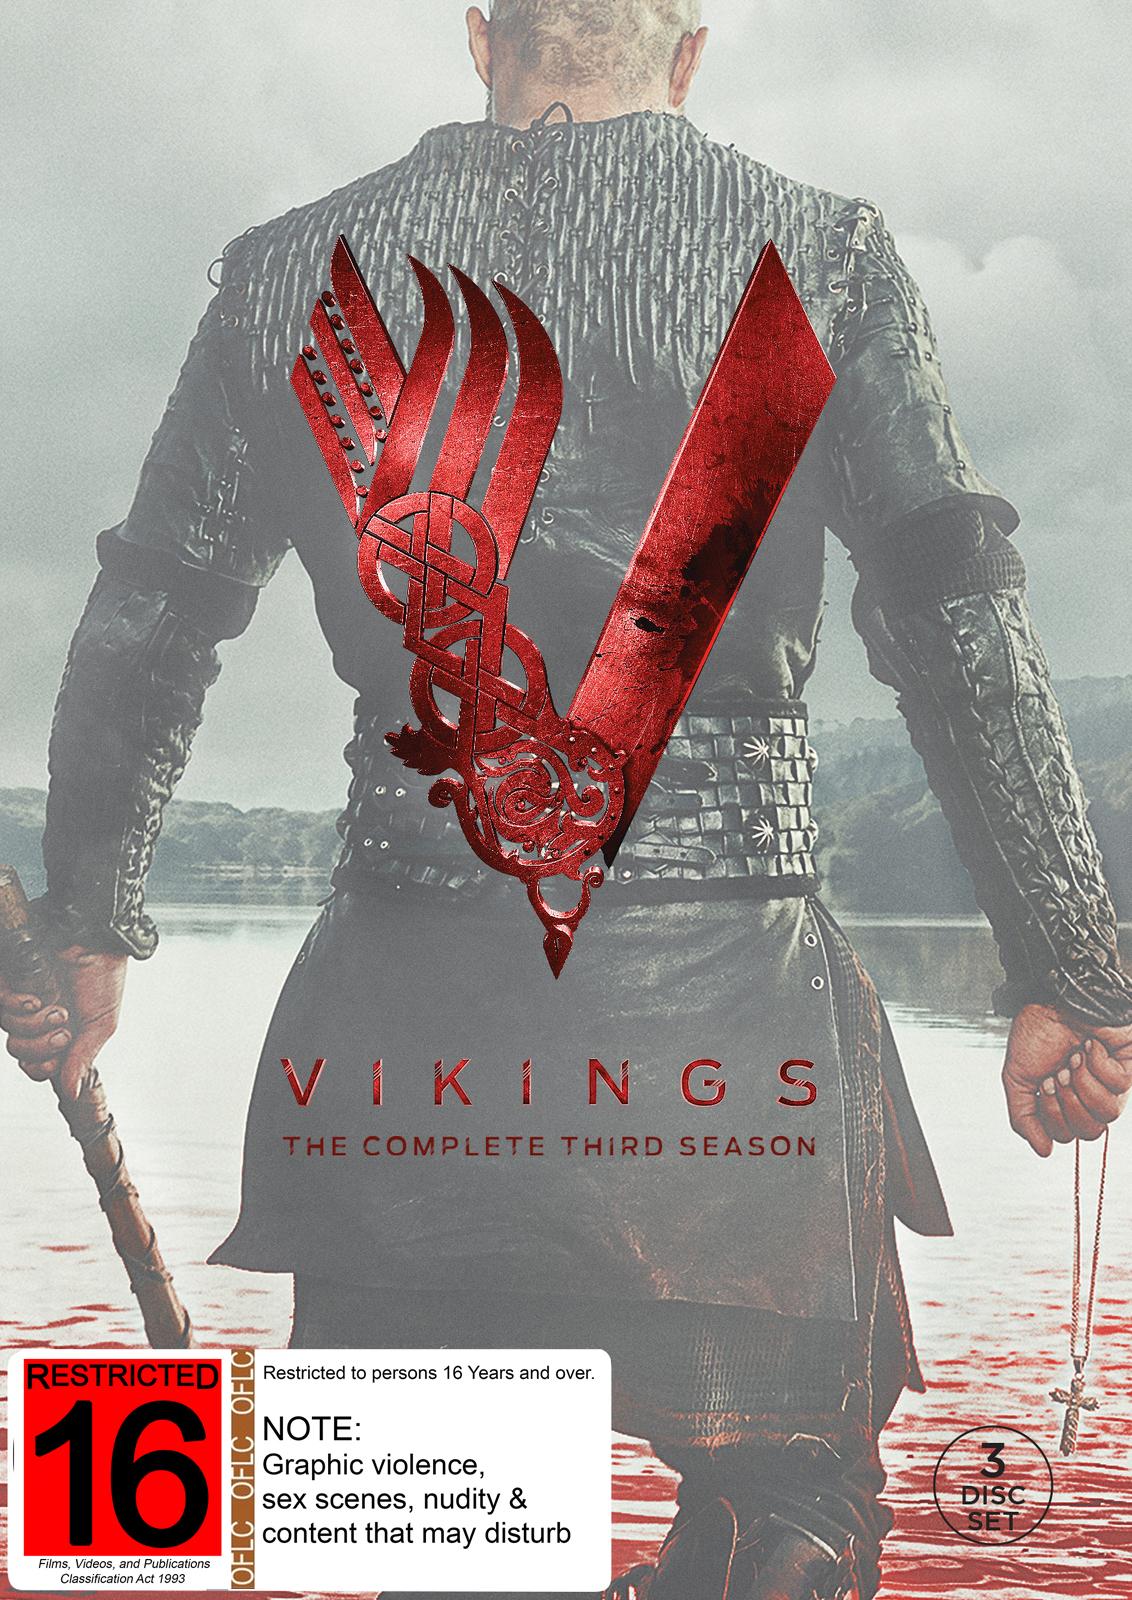 Vikings - The Complete Third Season on DVD image